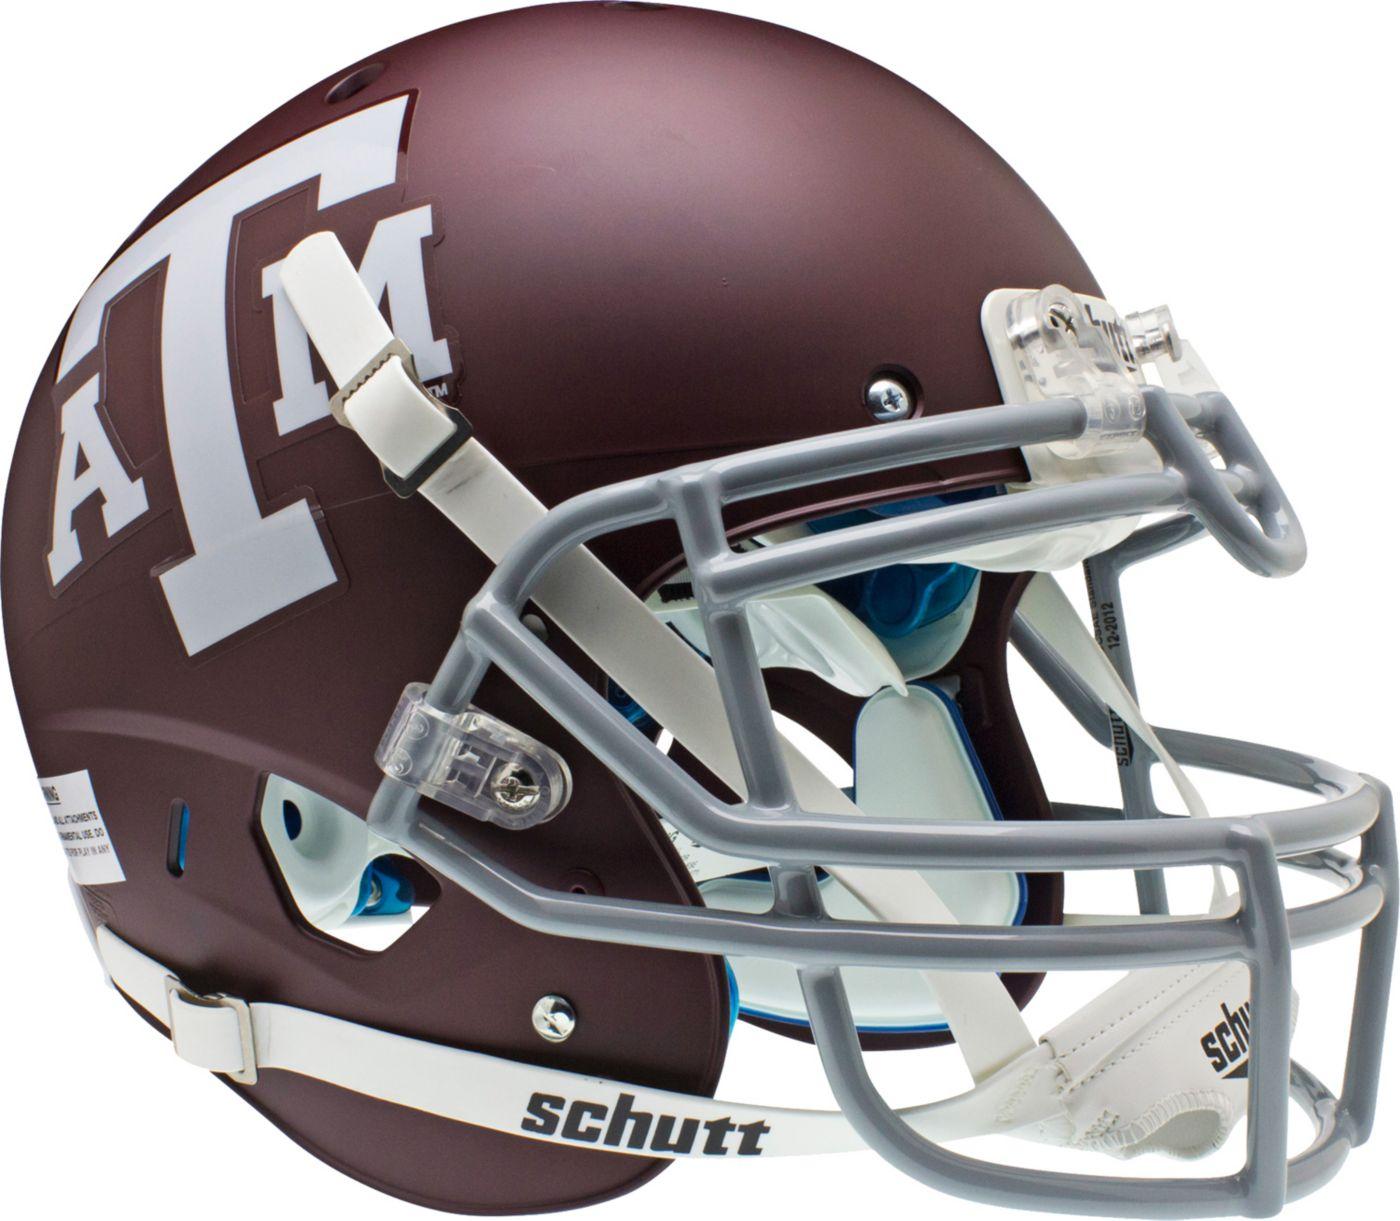 Schutt Texas A&M Aggies XP Authentic Football Helmet